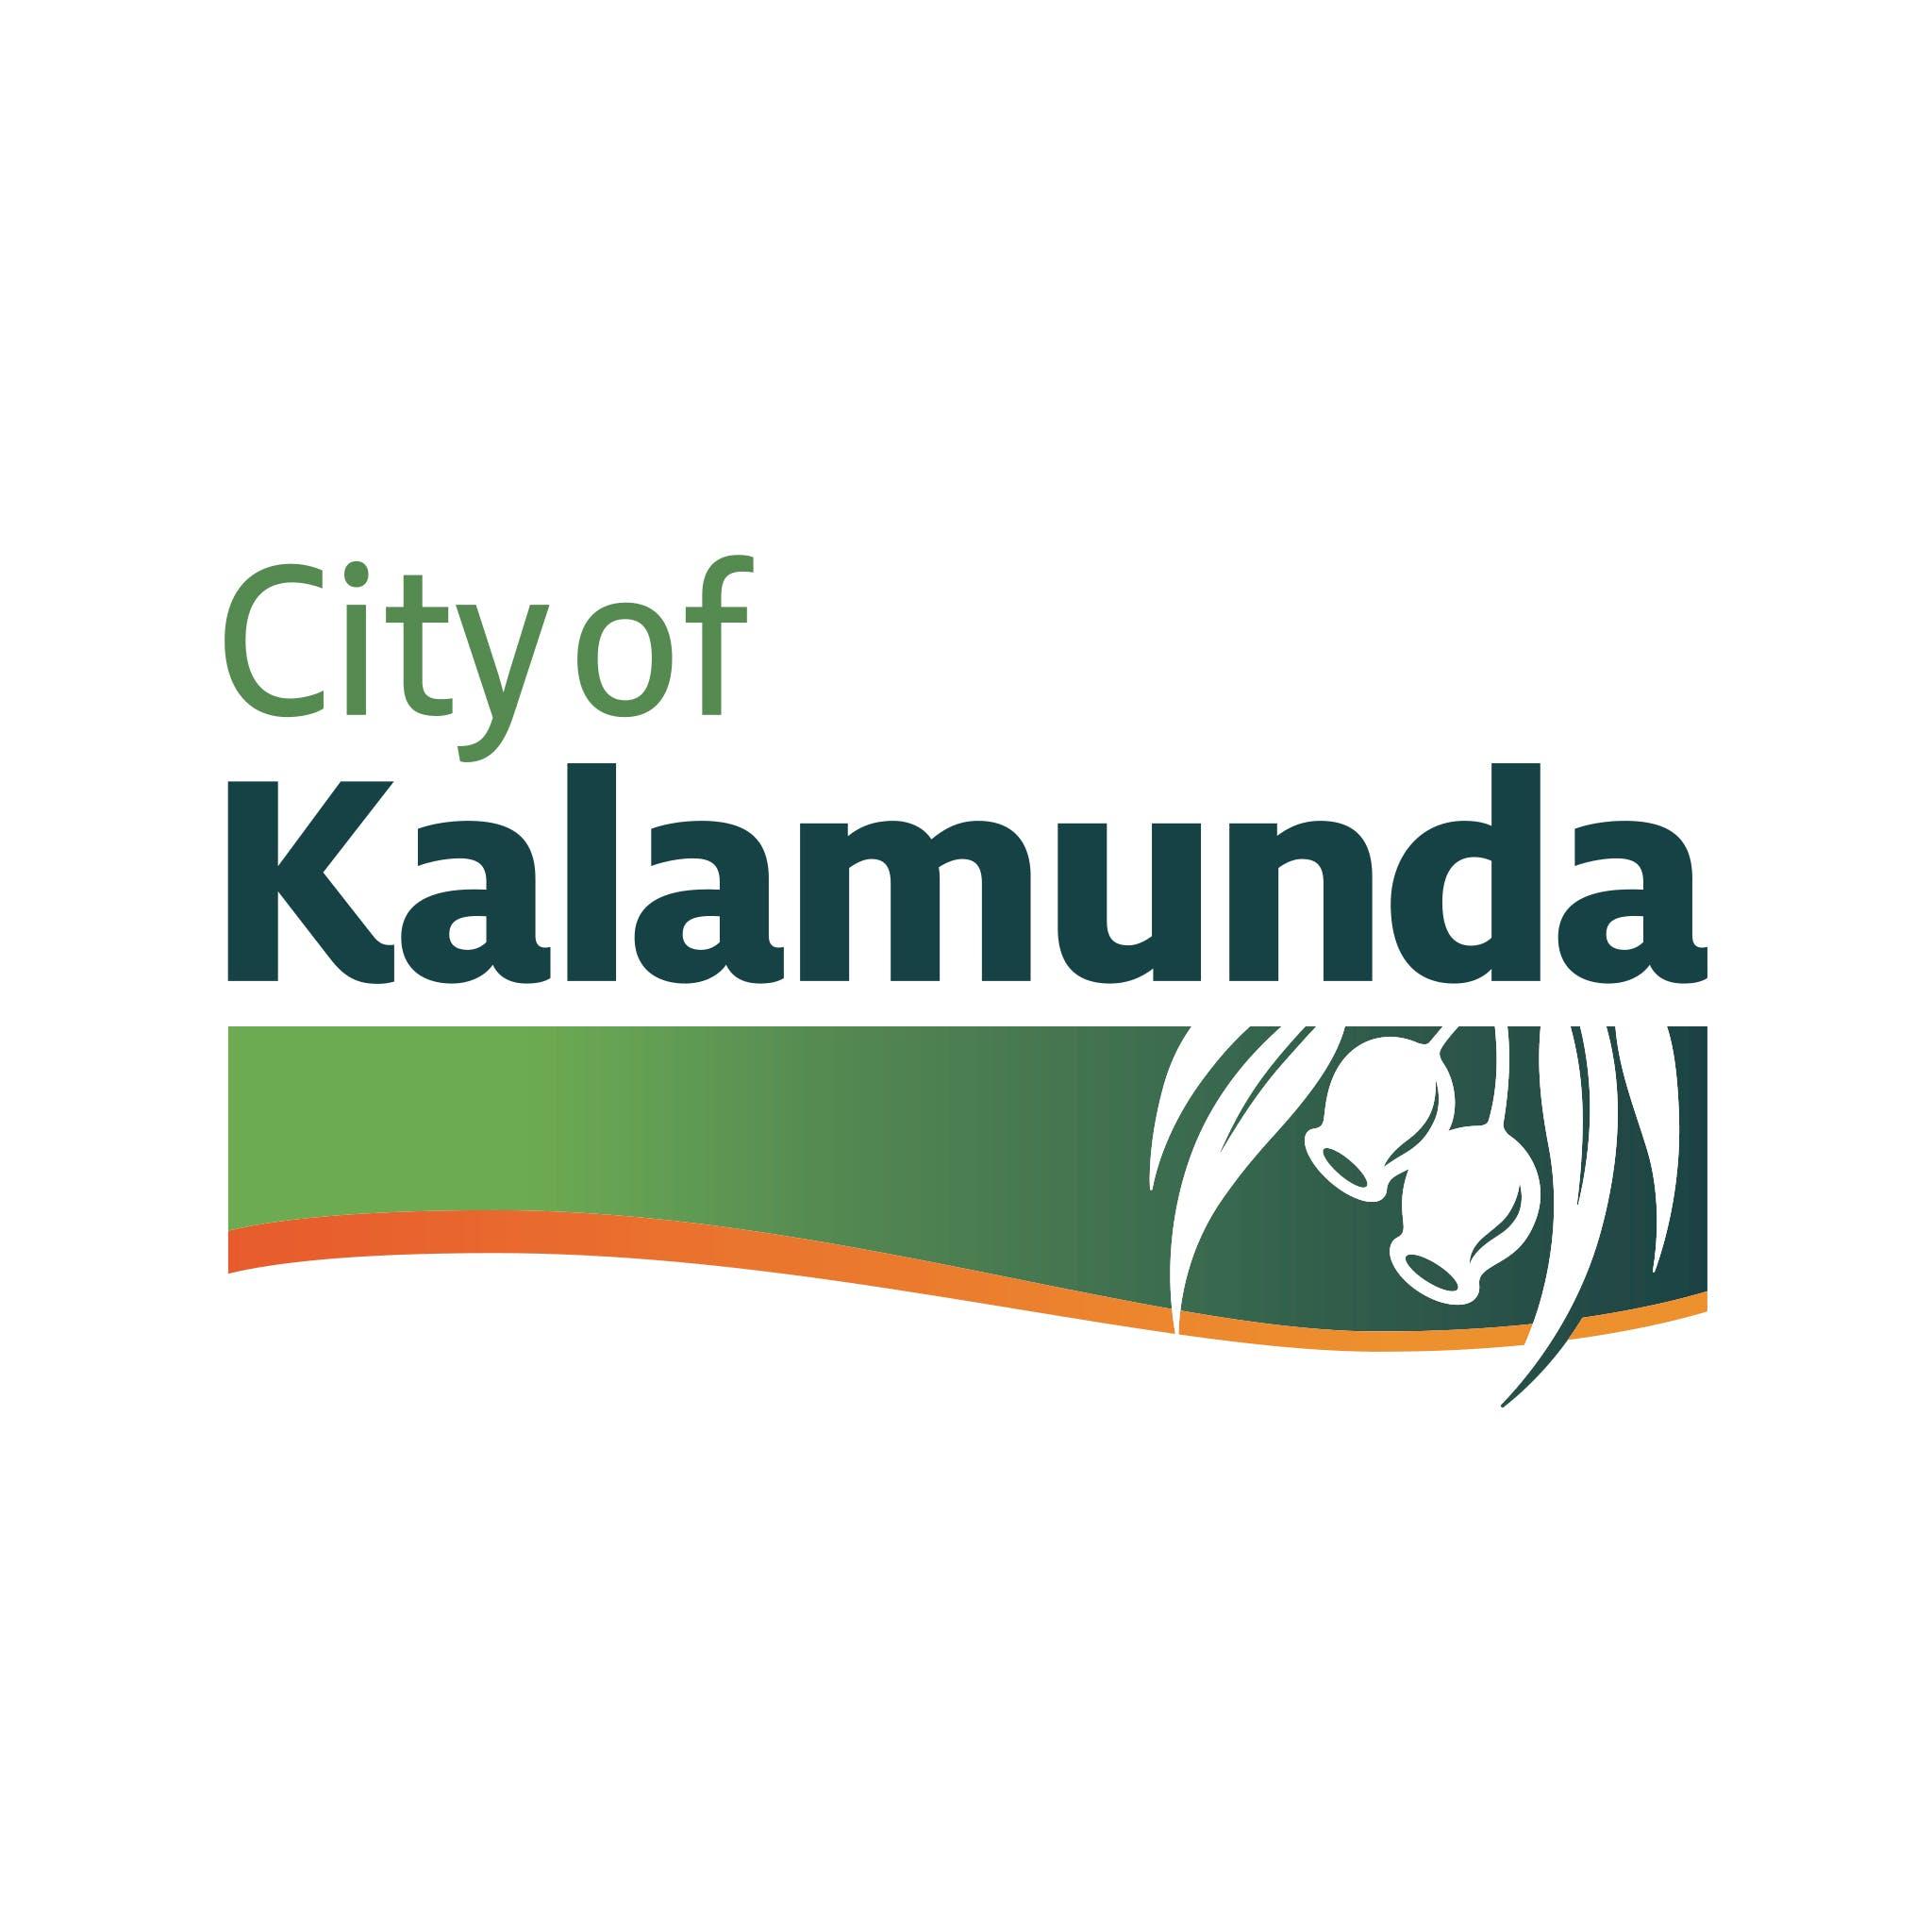 City of kalamunda logo